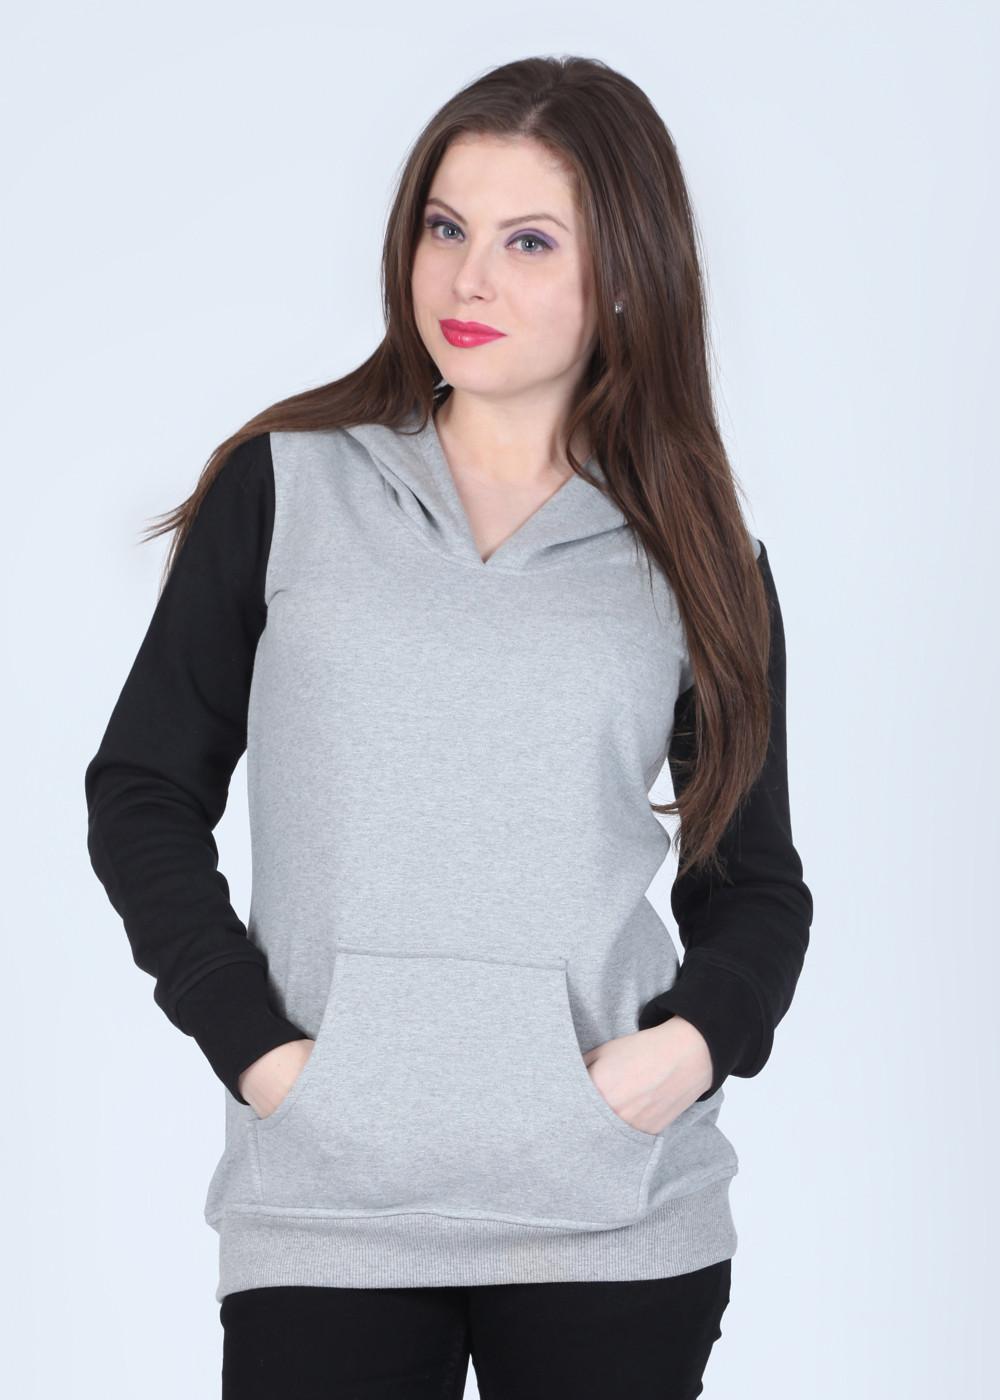 Buy Femella Front Ruffle Top For Women: Buy Femella Solid Casual Women's Sweater @ ₹ 1450 By